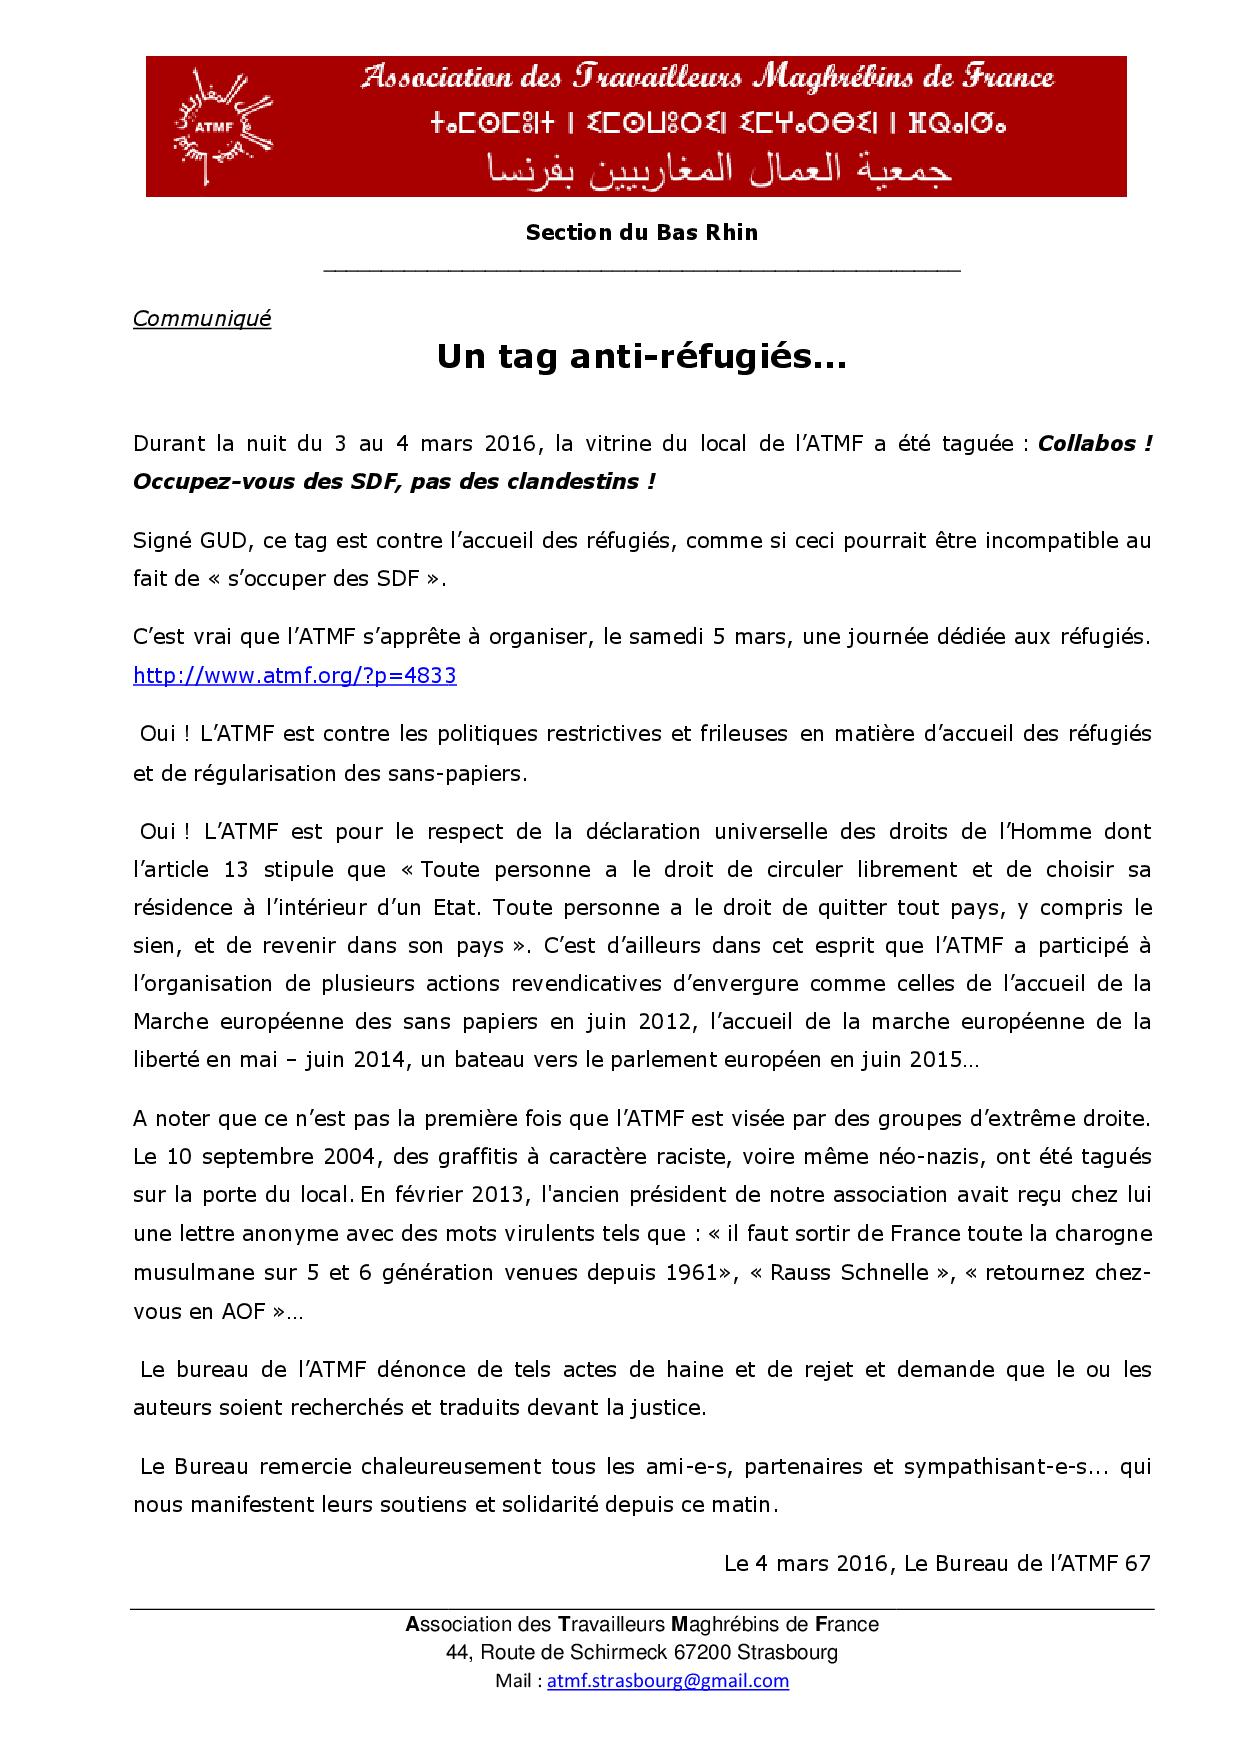 Atmf - communiqué tags gud 04 mars 2016